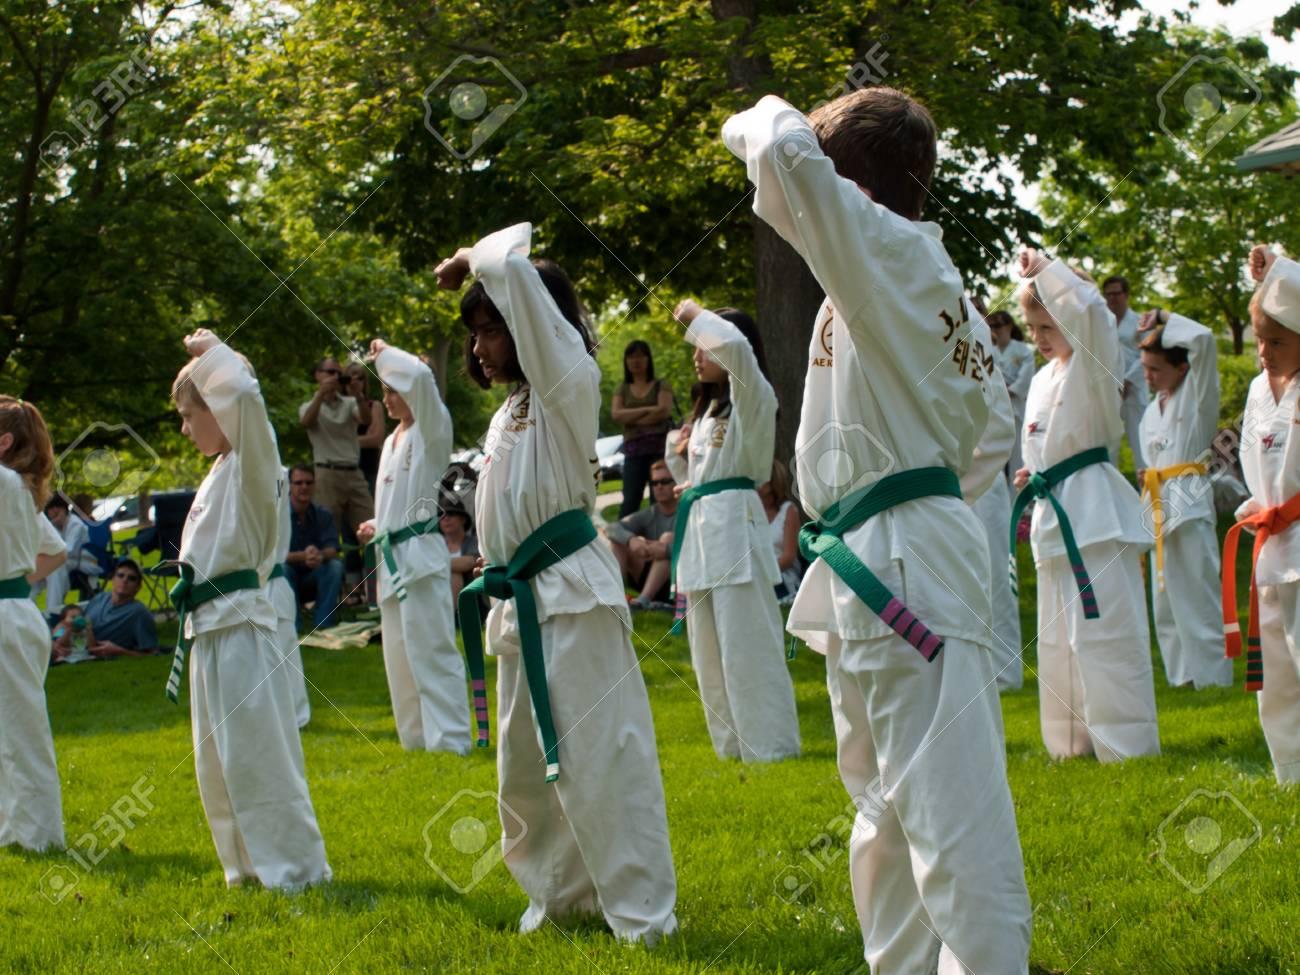 Belt test at J.W. Kim TaeKwonDo School. At the park in Greenwood Village, Colorado. June 2011. Stock Photo - 9671572